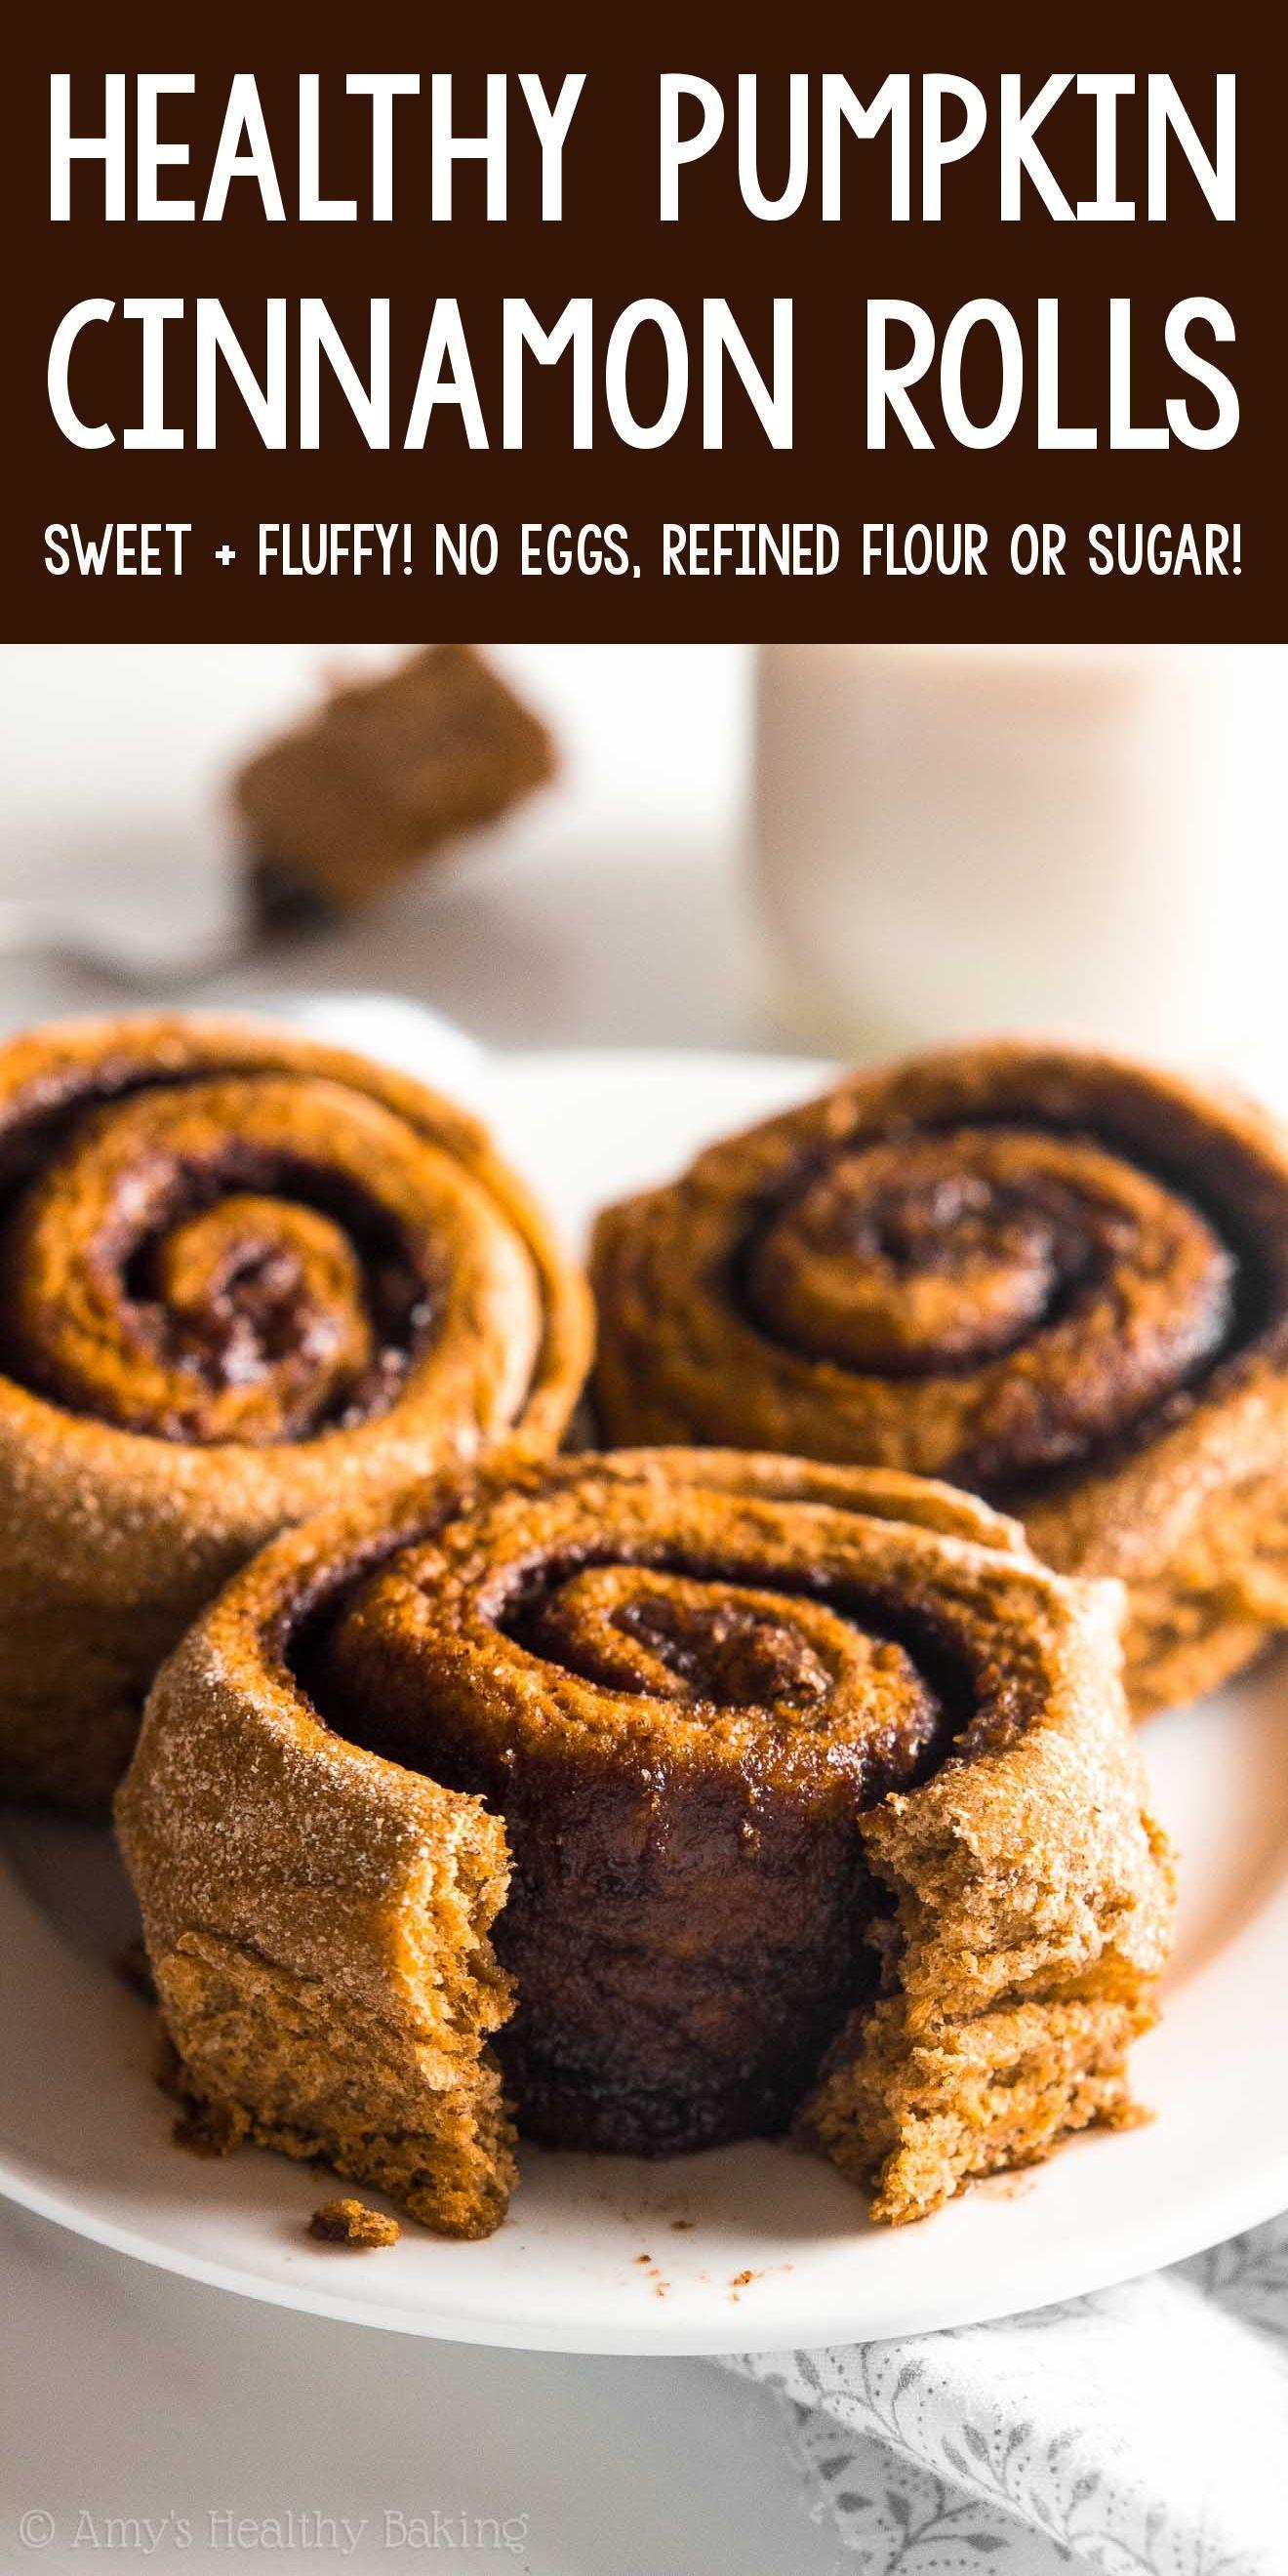 The Ultimate Healthy Pumpkin Cinnamon Rolls In 2020 Healthy Pumpkin Dessert Vegan Pumpkin Recipes Healthy Baking